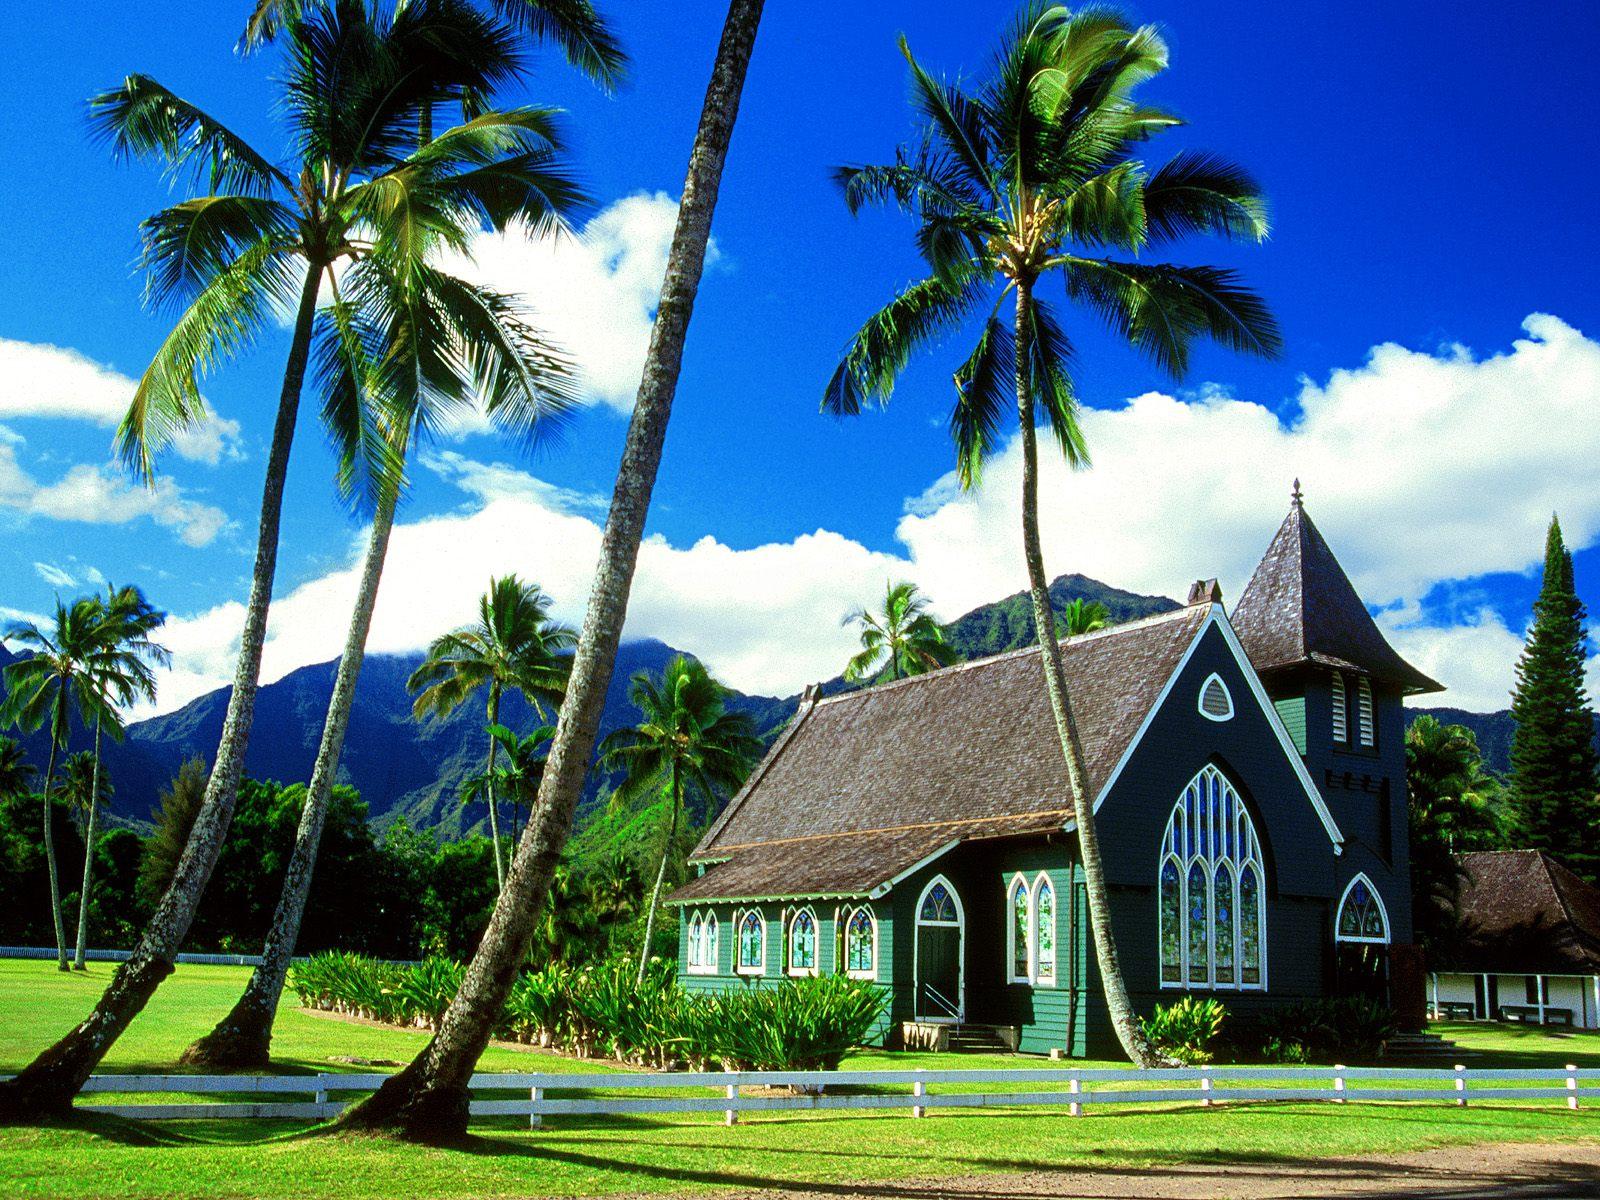 Waioli Huiia Church, Hanalei, Kauai, Hawaii